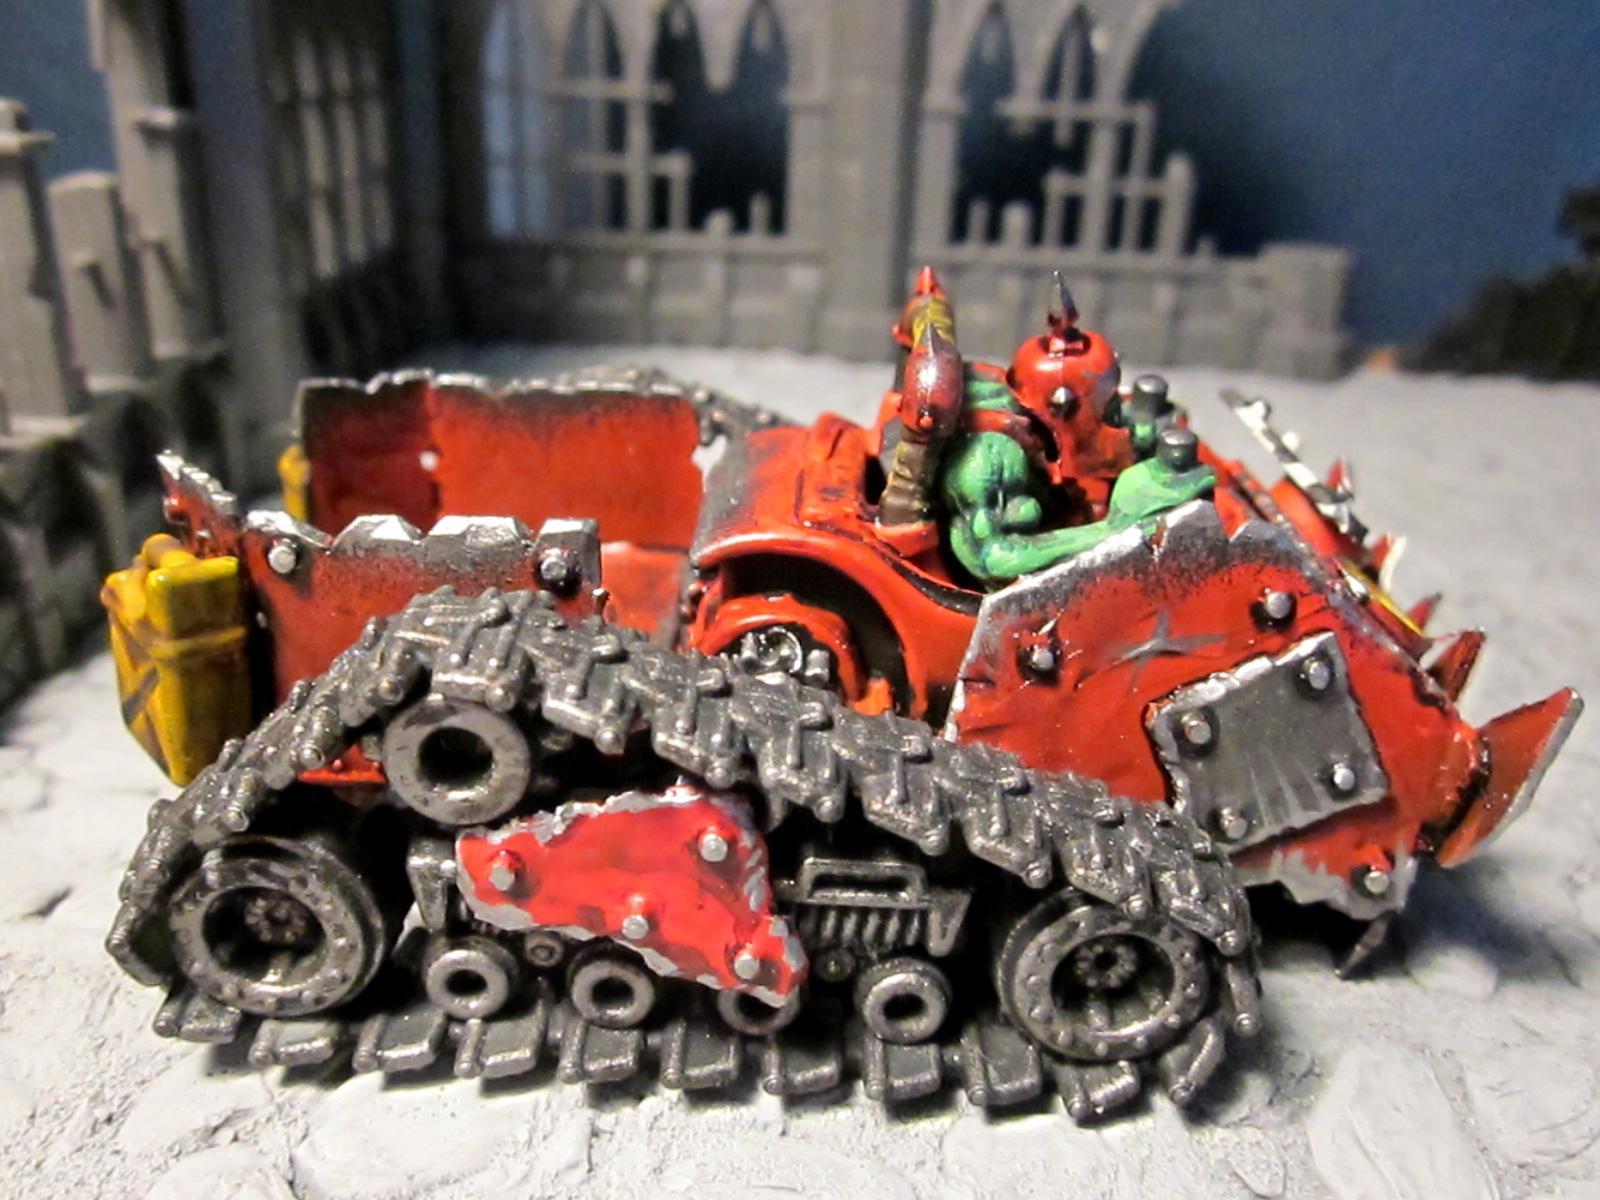 Buggy, Orks, Trakk, Warbuggy, Warhammer 40,000, Wartrakk